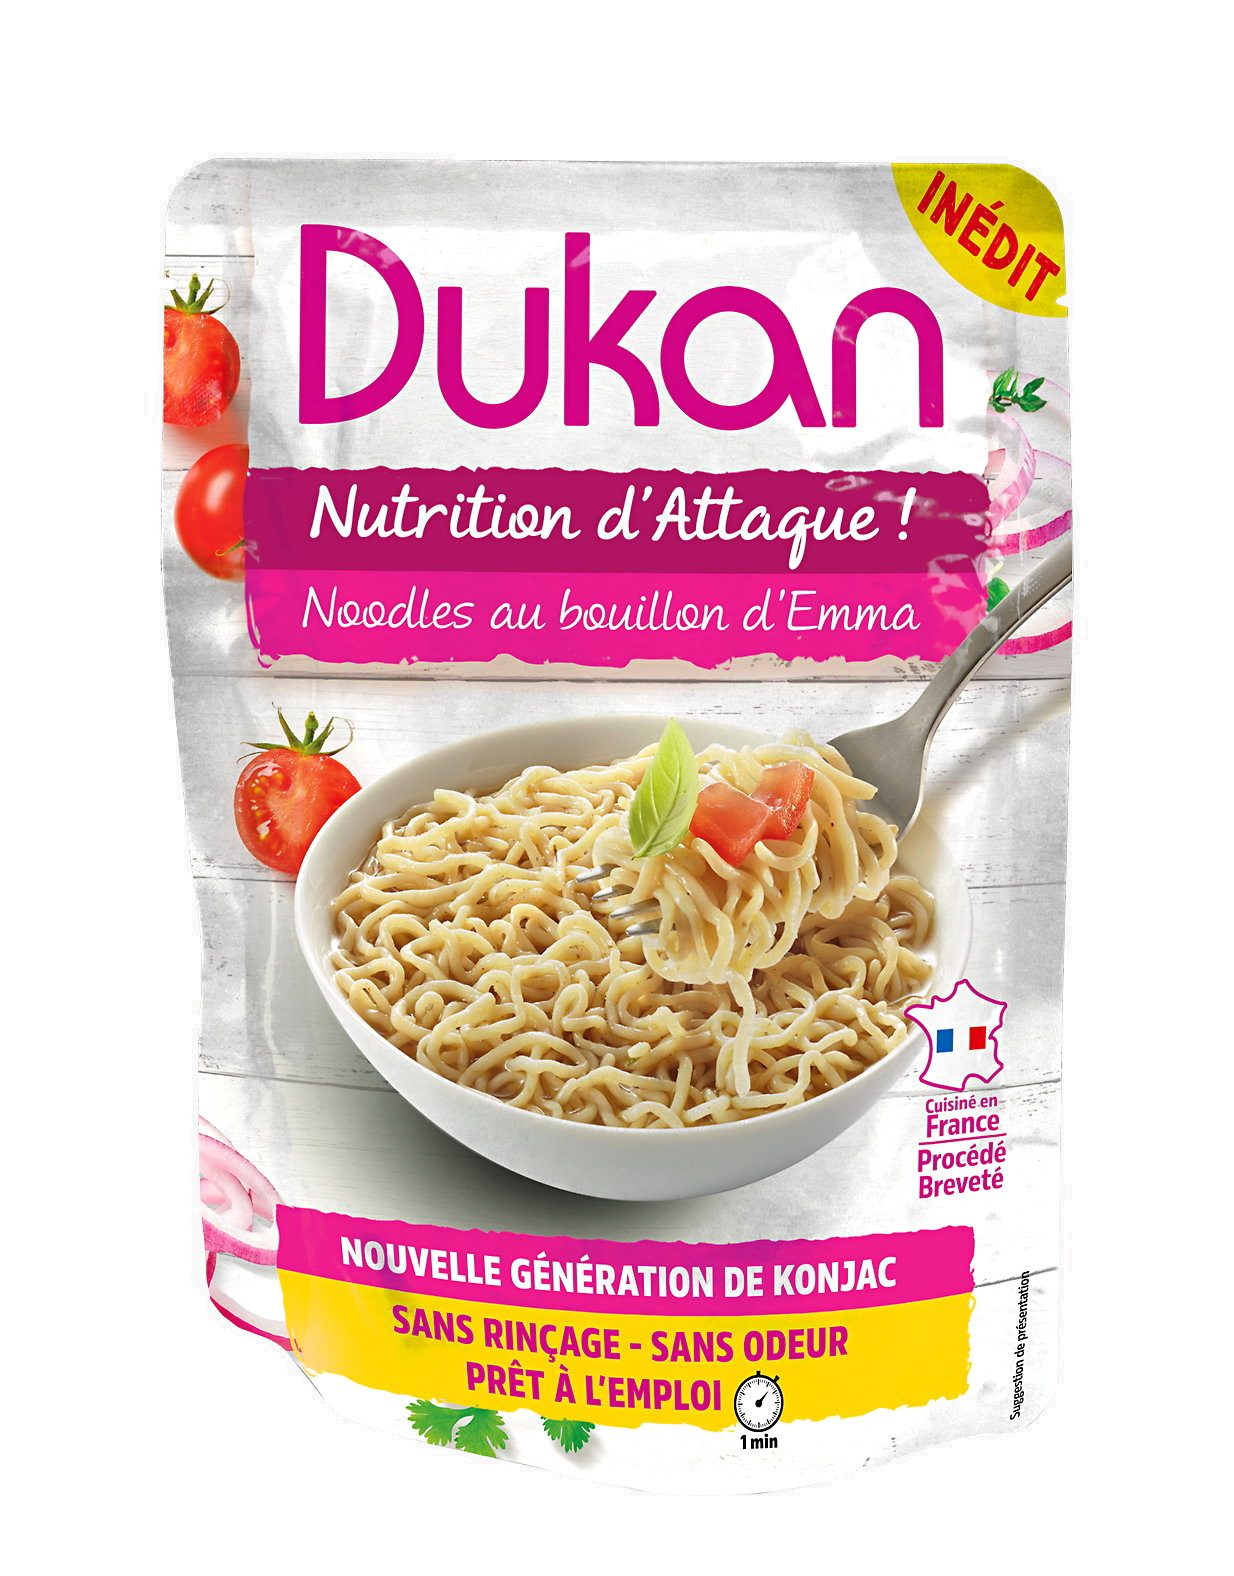 konjac noodles in vegetable broth by dukan 280 grams 6 17. Black Bedroom Furniture Sets. Home Design Ideas